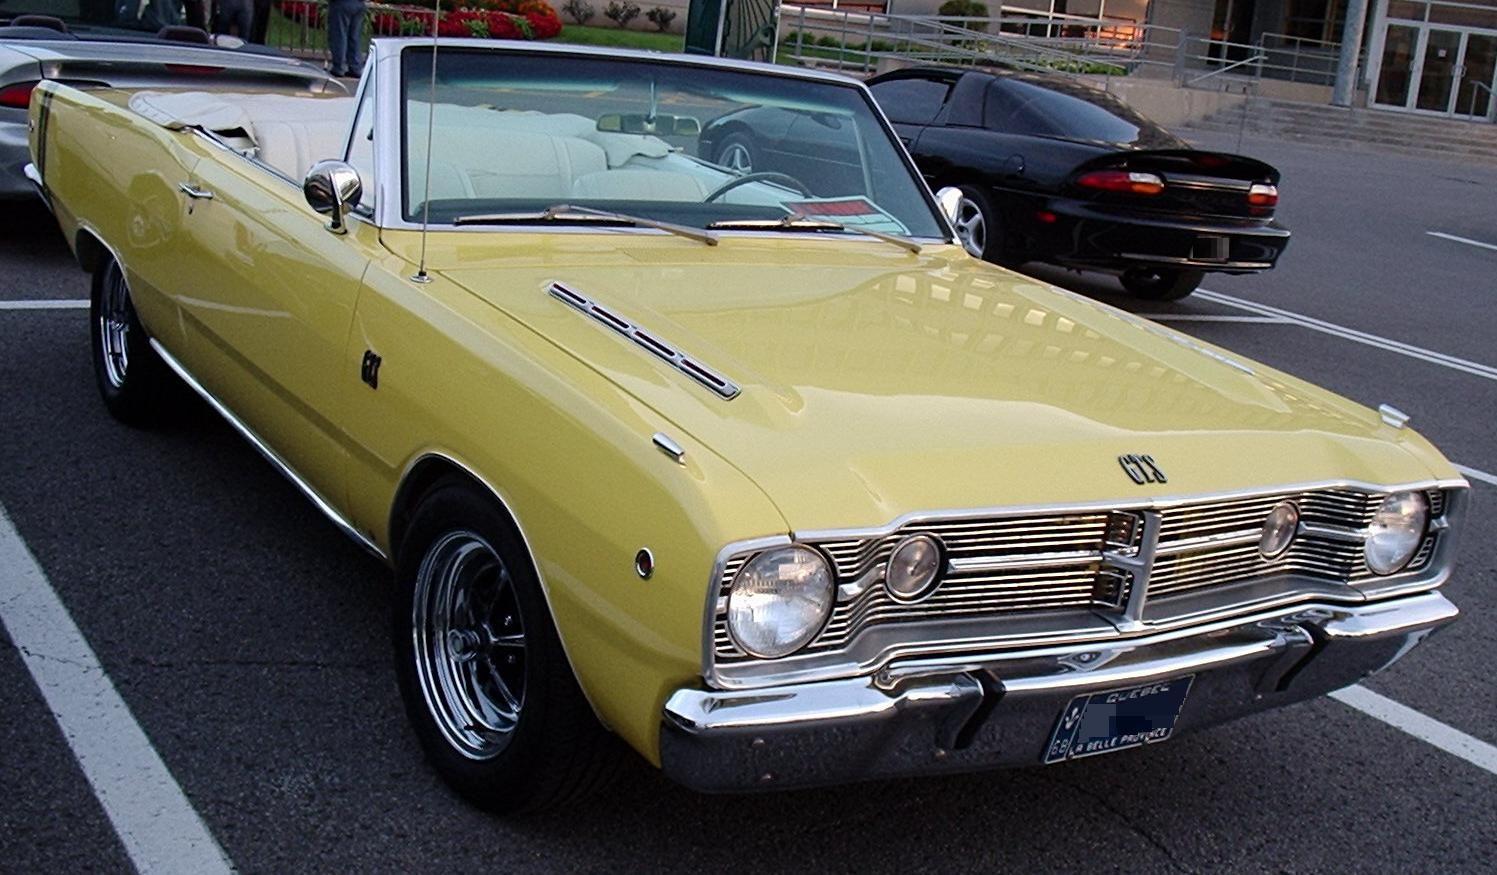 File:'68 Dodge Dart GTS (Les chauds vendredis '10).jpg